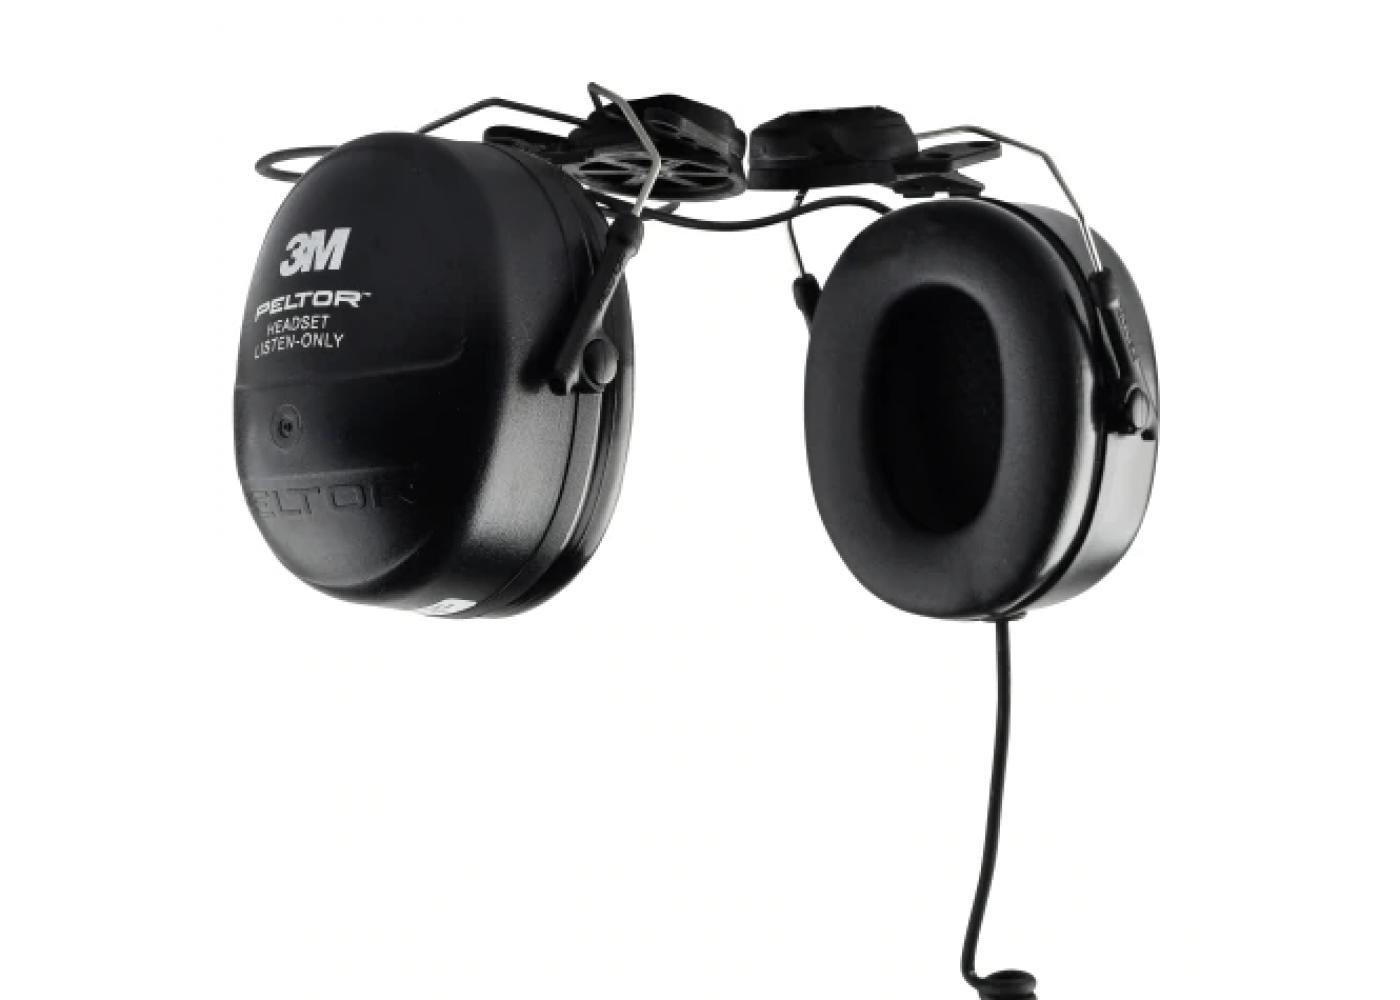 3.5mm Receive-only Earpiece For Motorola Kenwood RSM Handheld